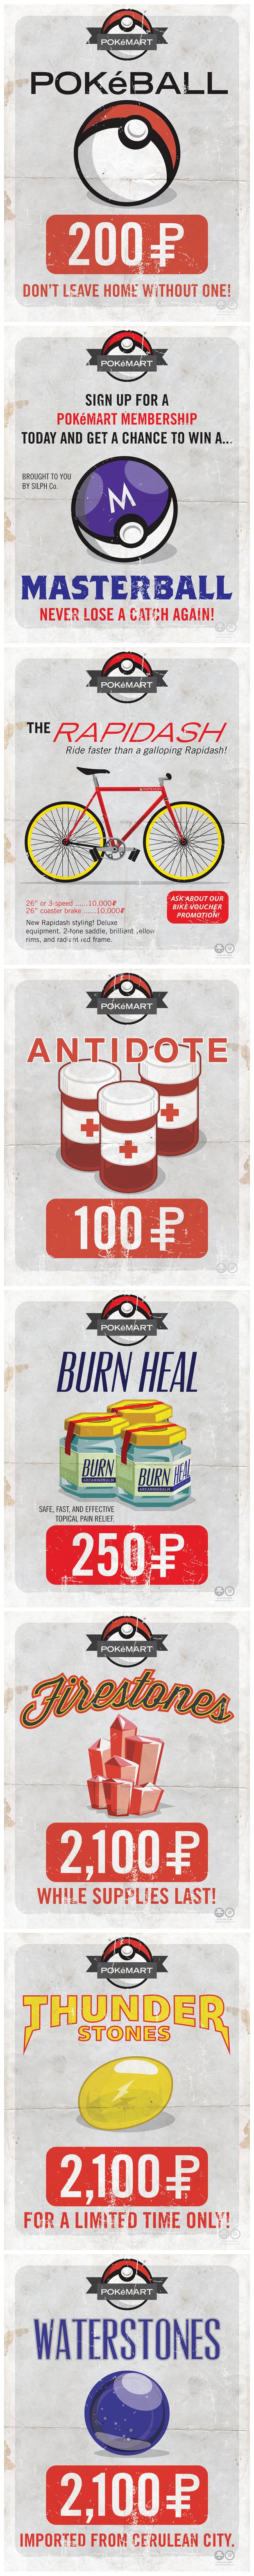 Poké Mart Posters. Source: www.behance.net/gallery/PokeMart/3685883.. for future use Pokemon posters